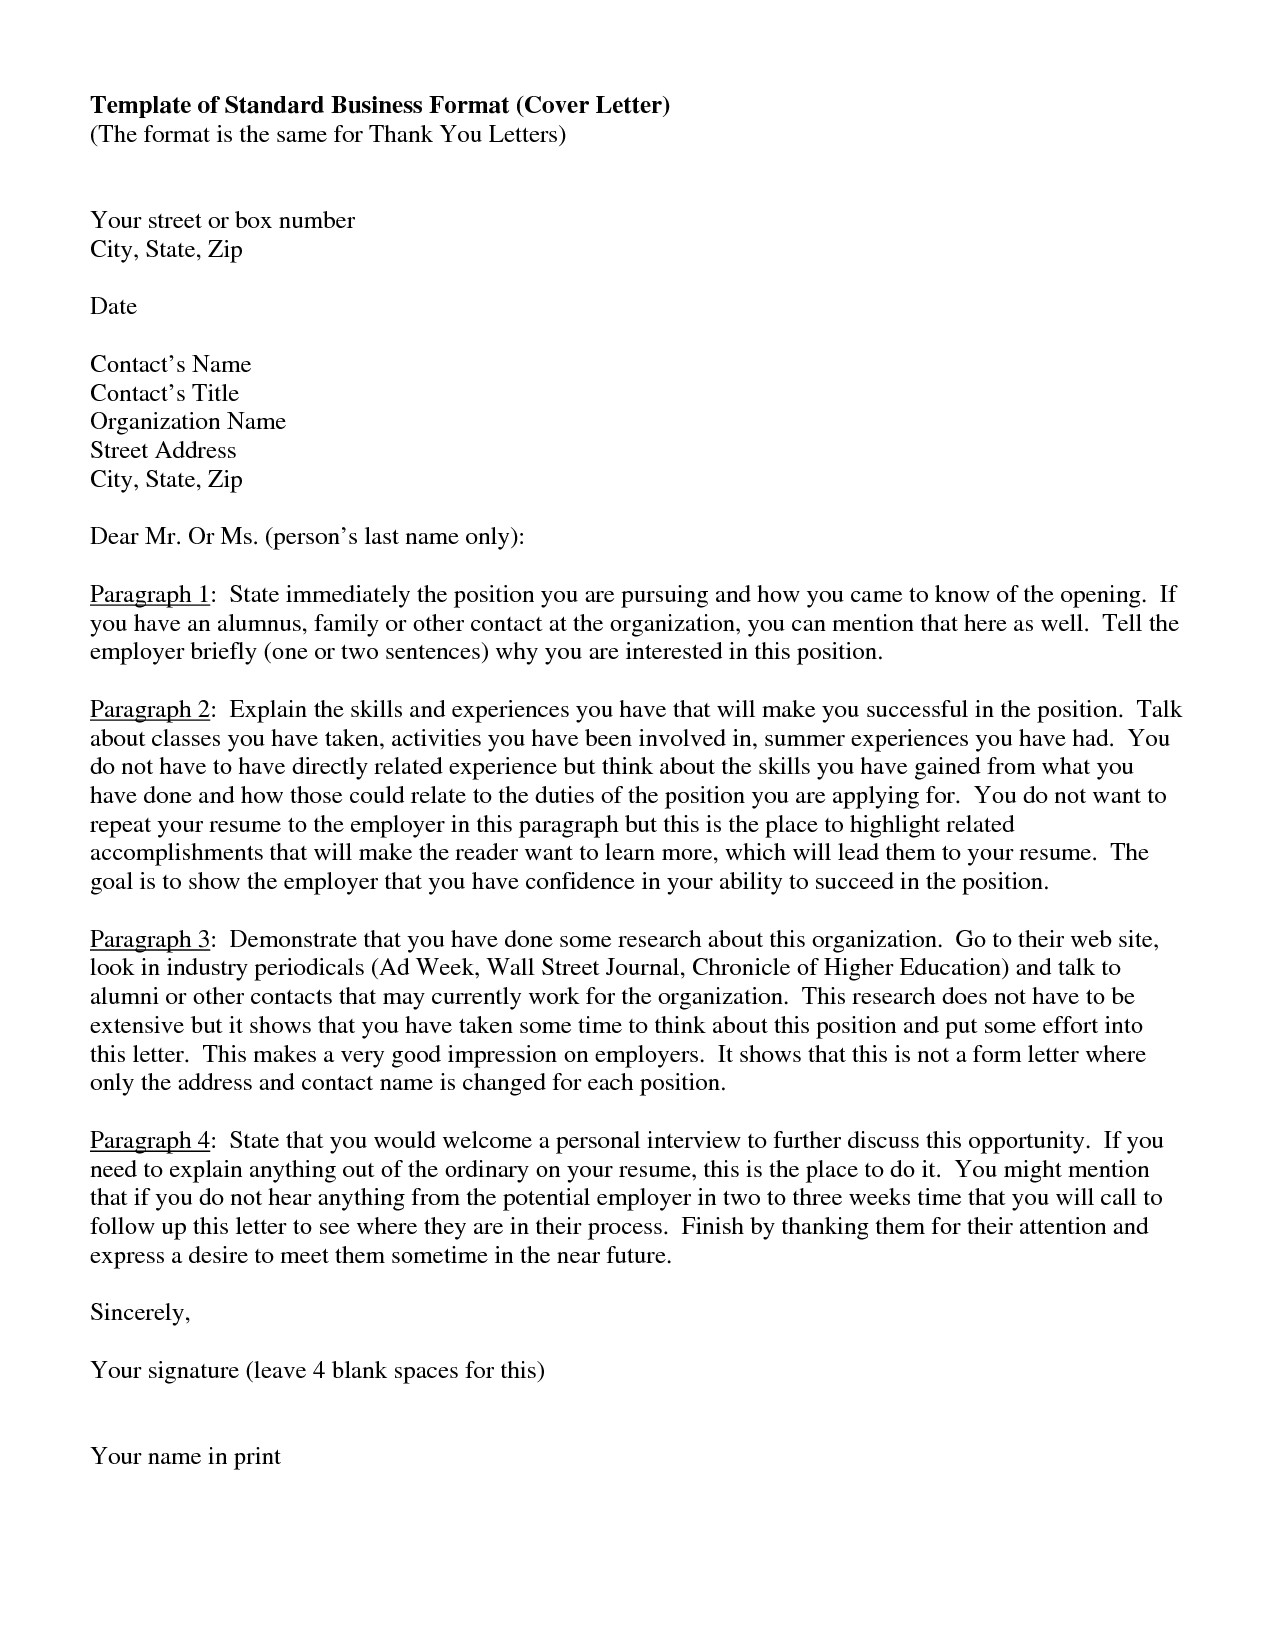 cover letter standard format